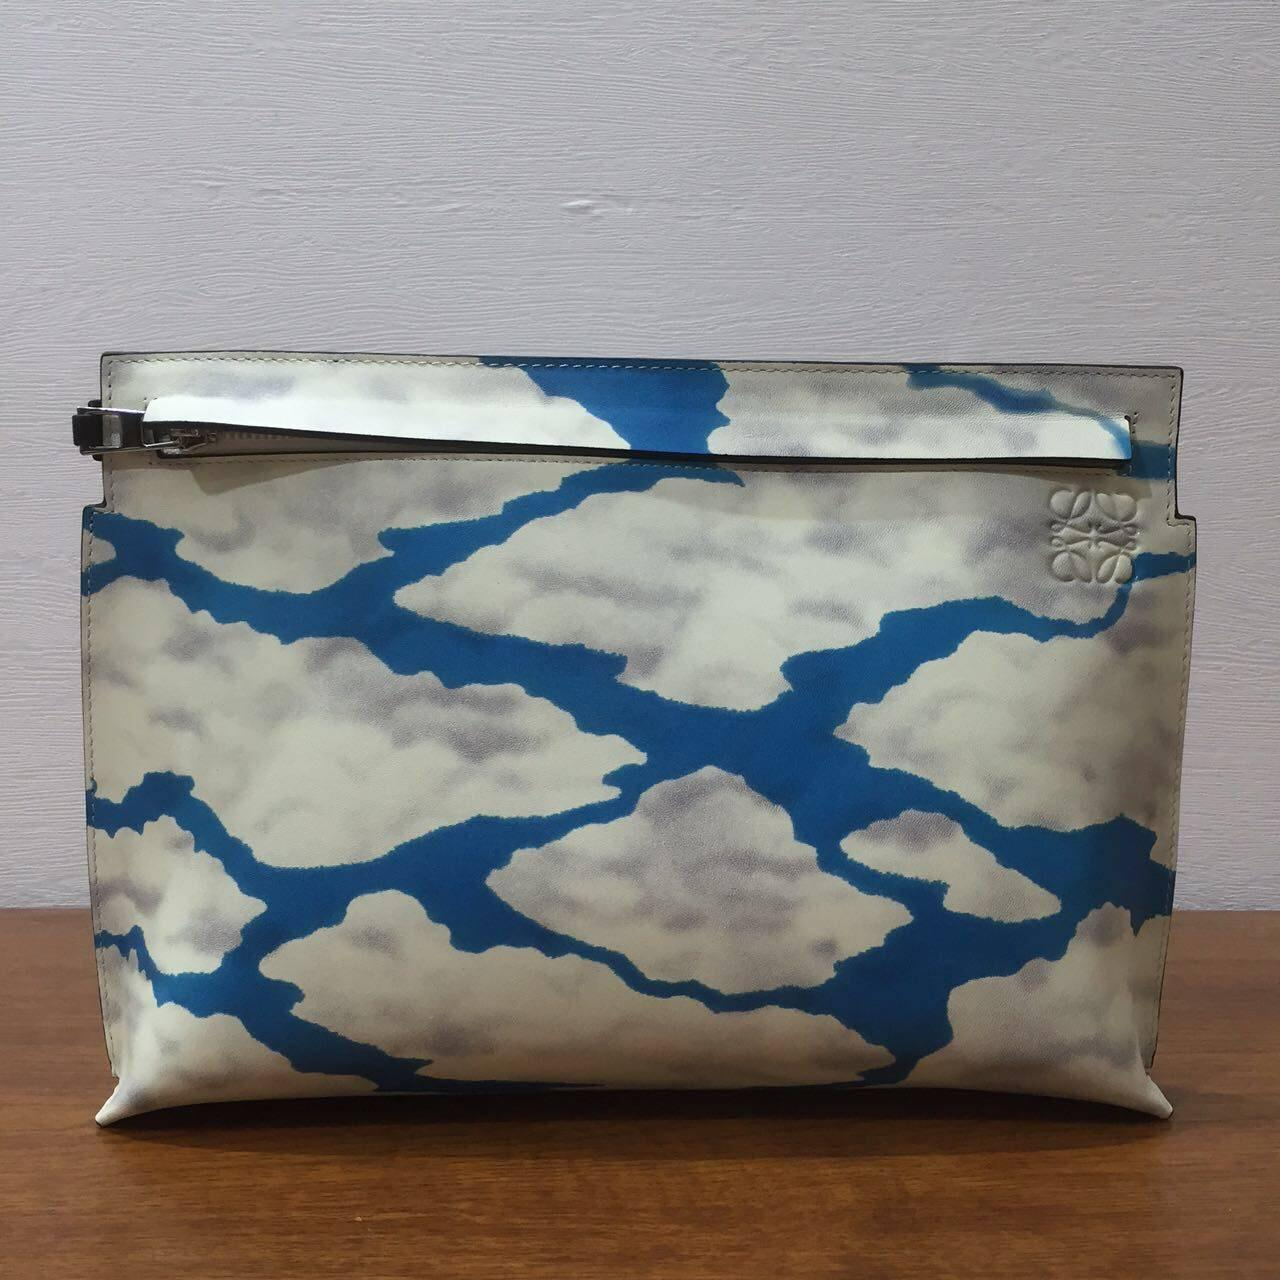 Loewe羅意威 T- pouch bag系列之藍天白雲手拿包 飾雲朵圖案